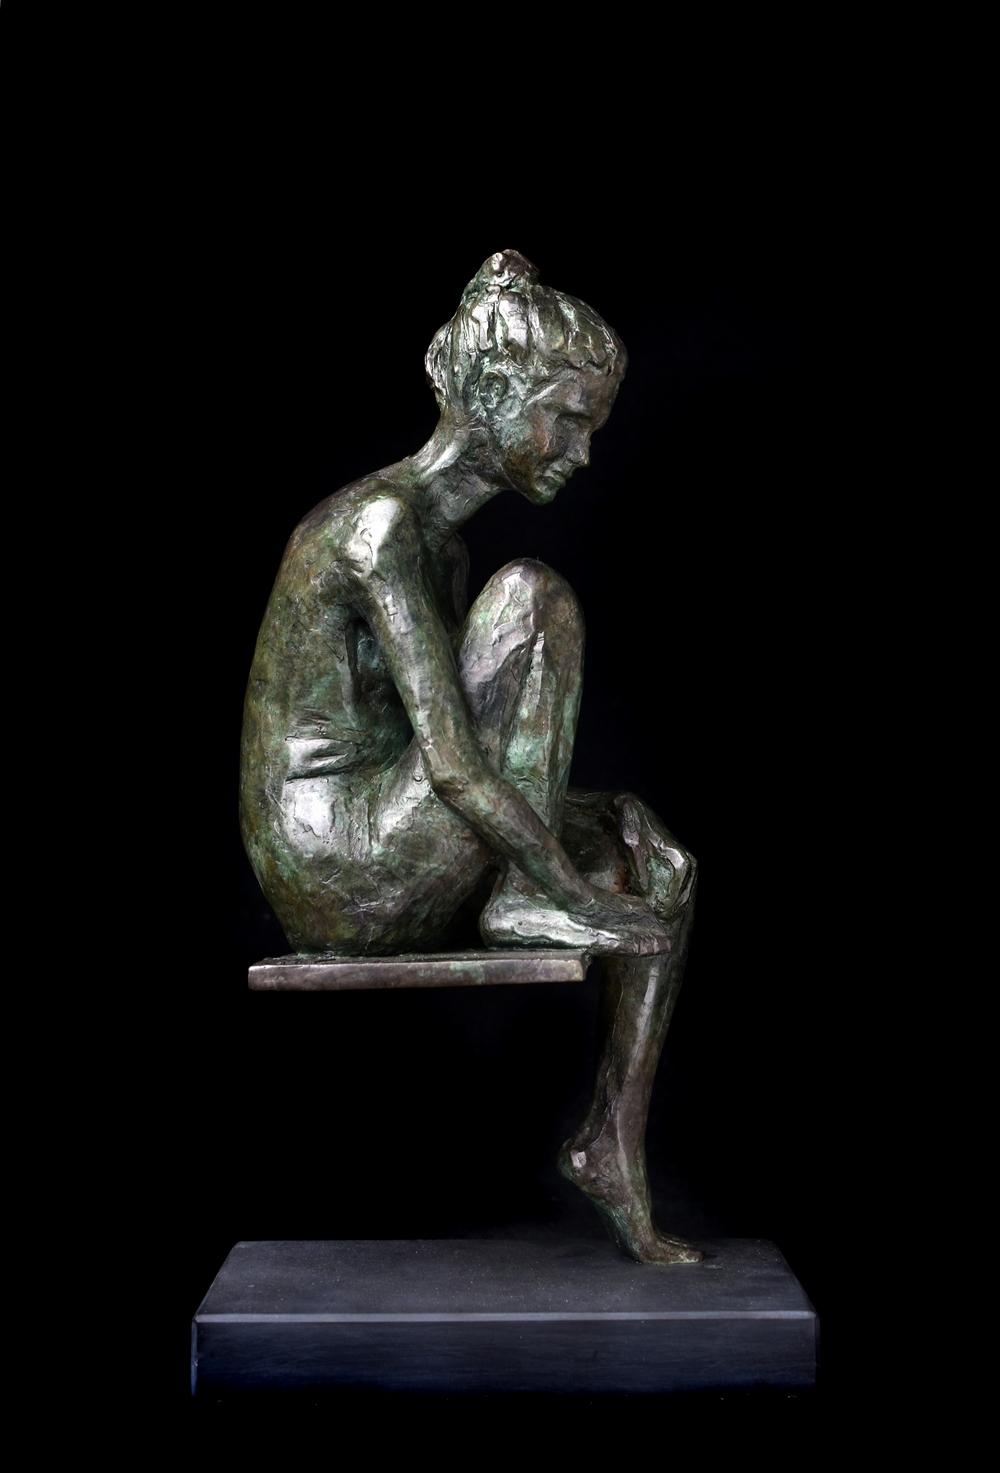 Contemplation - Caroline Wilson